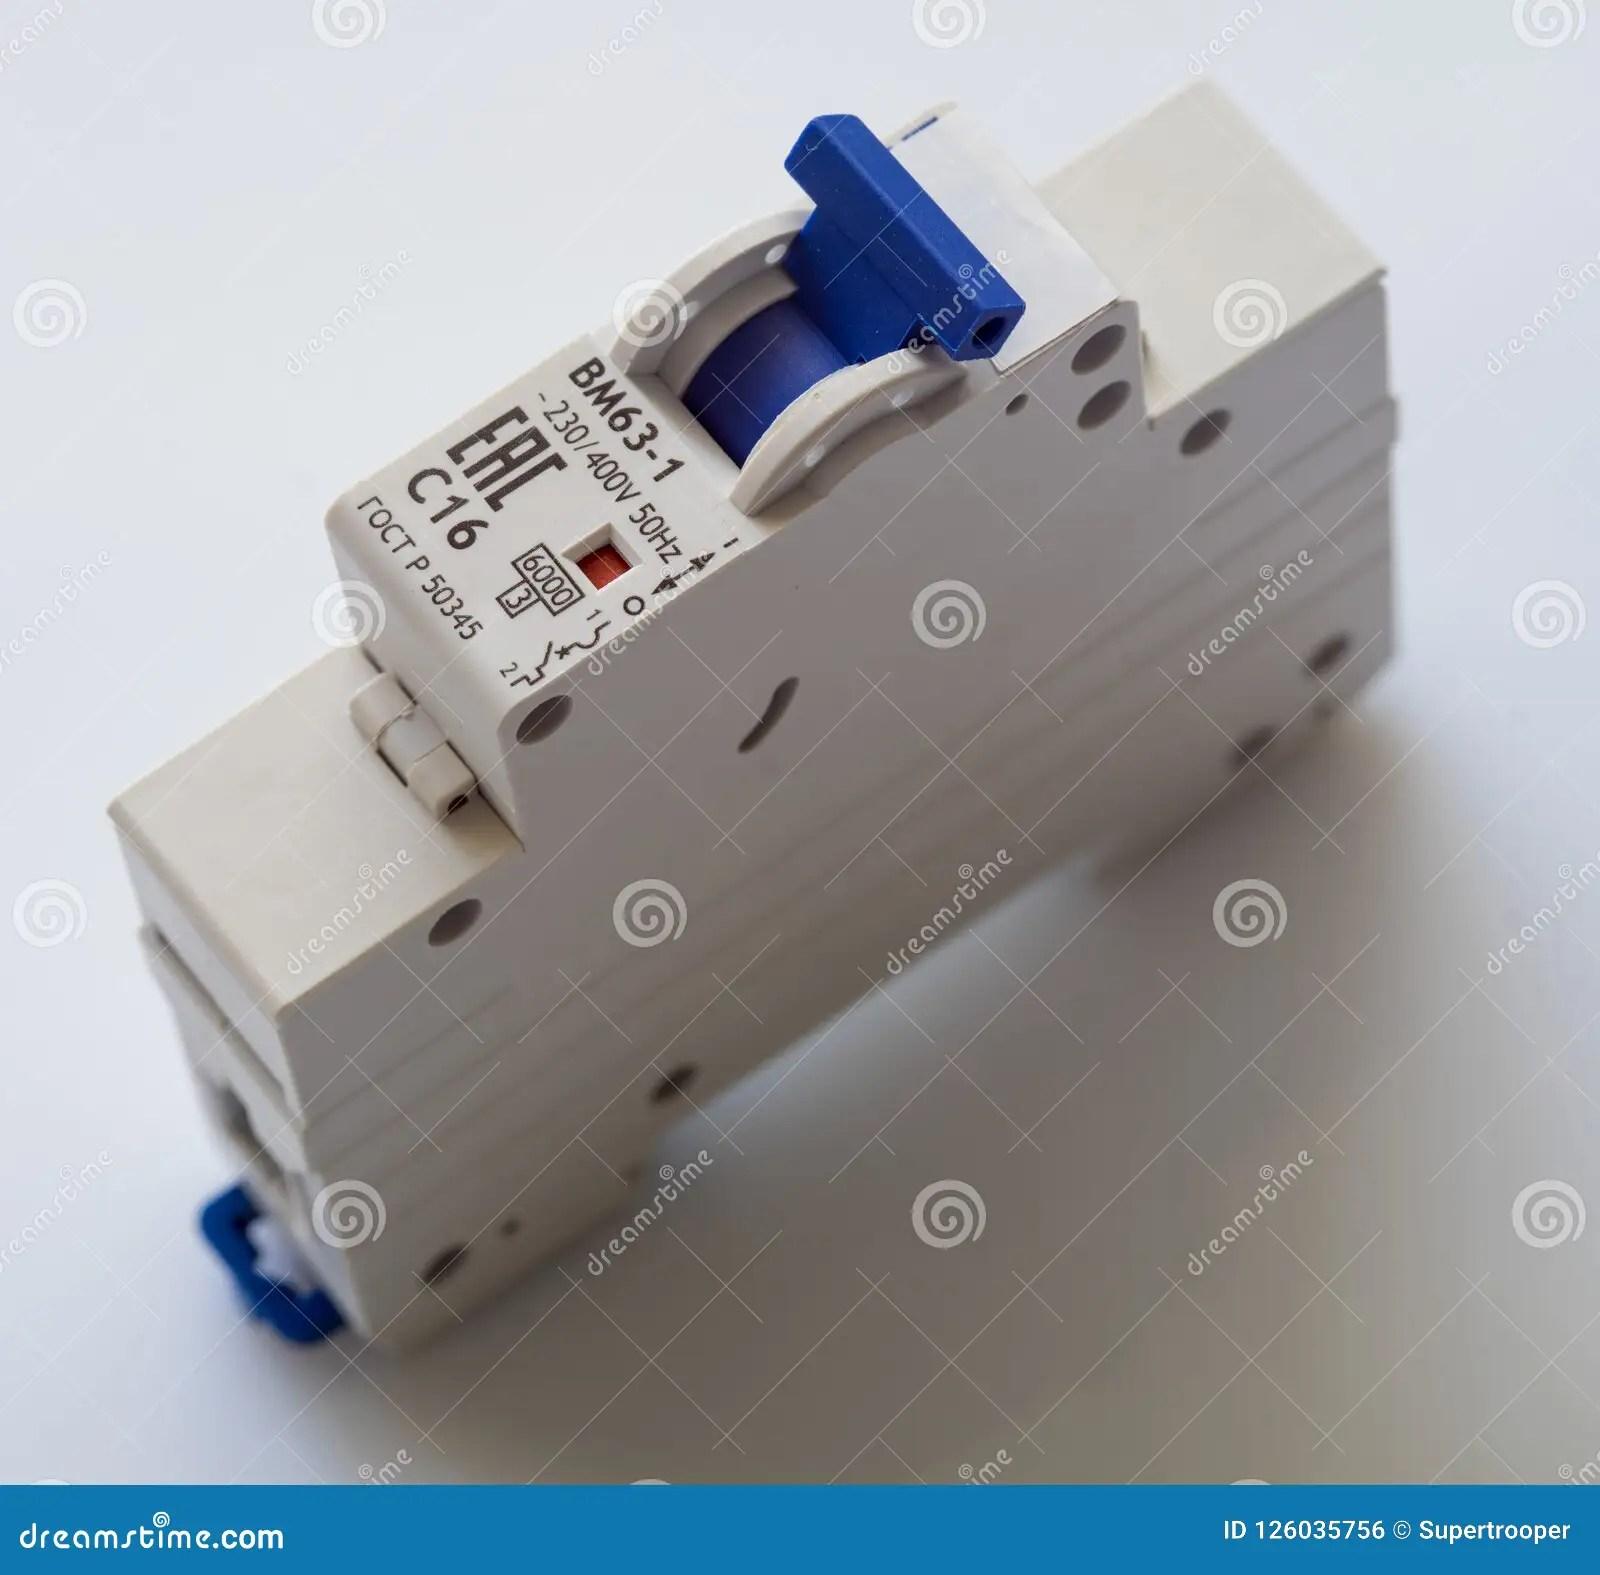 hight resolution of com gasclubcar 20310gasclubcardiagrams19842005ahtml wiring diagram automatic switching circuit electricalequipmentcircuit circuit 1 com gasclubcar